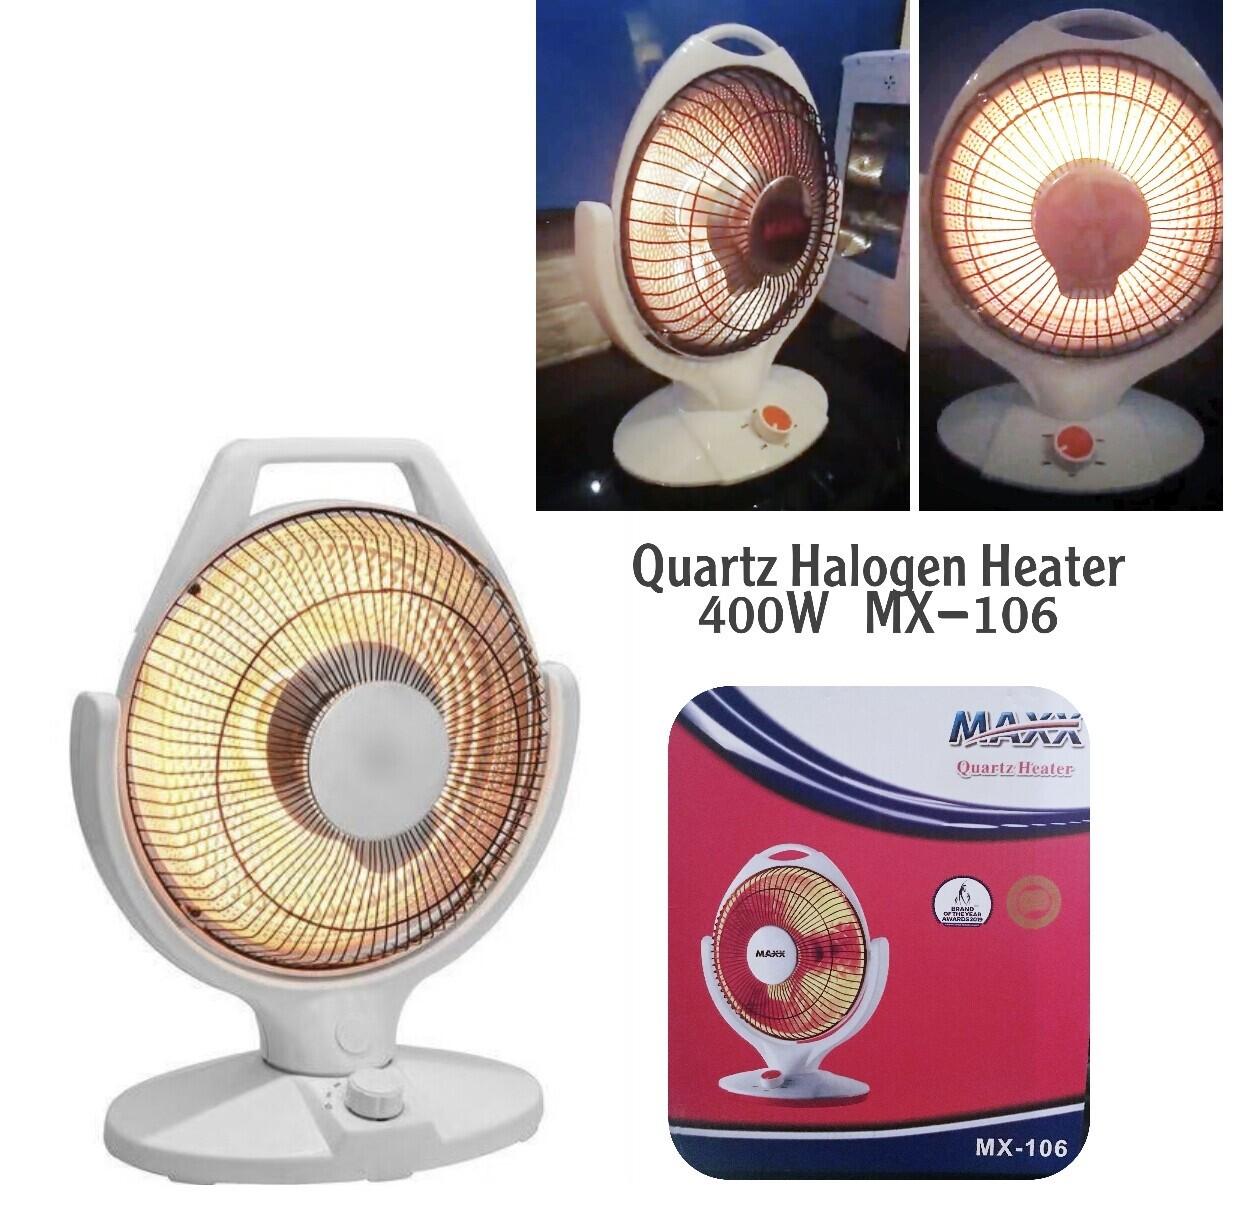 Halogen Heater (MX-106)